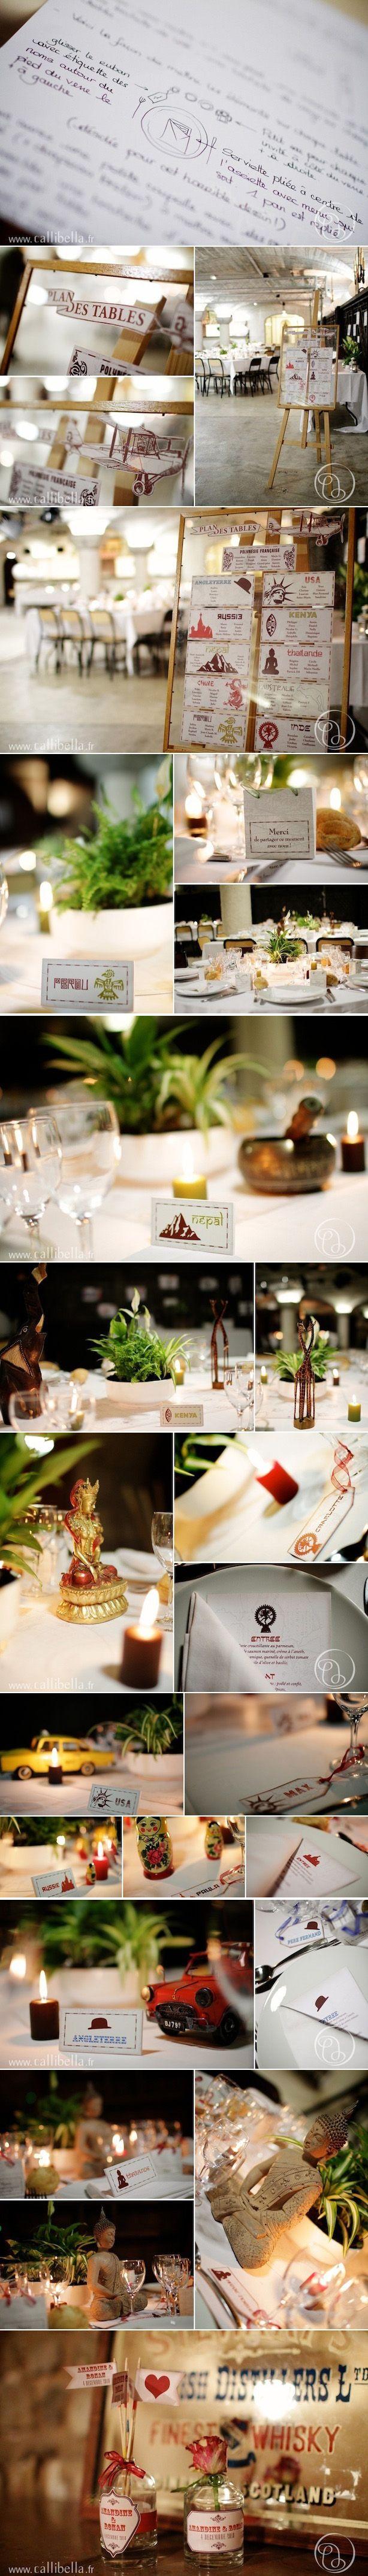 5.amandine-et-ronan-mariage-d-hiver-lyon-callibella-le-blog-de-madame-c